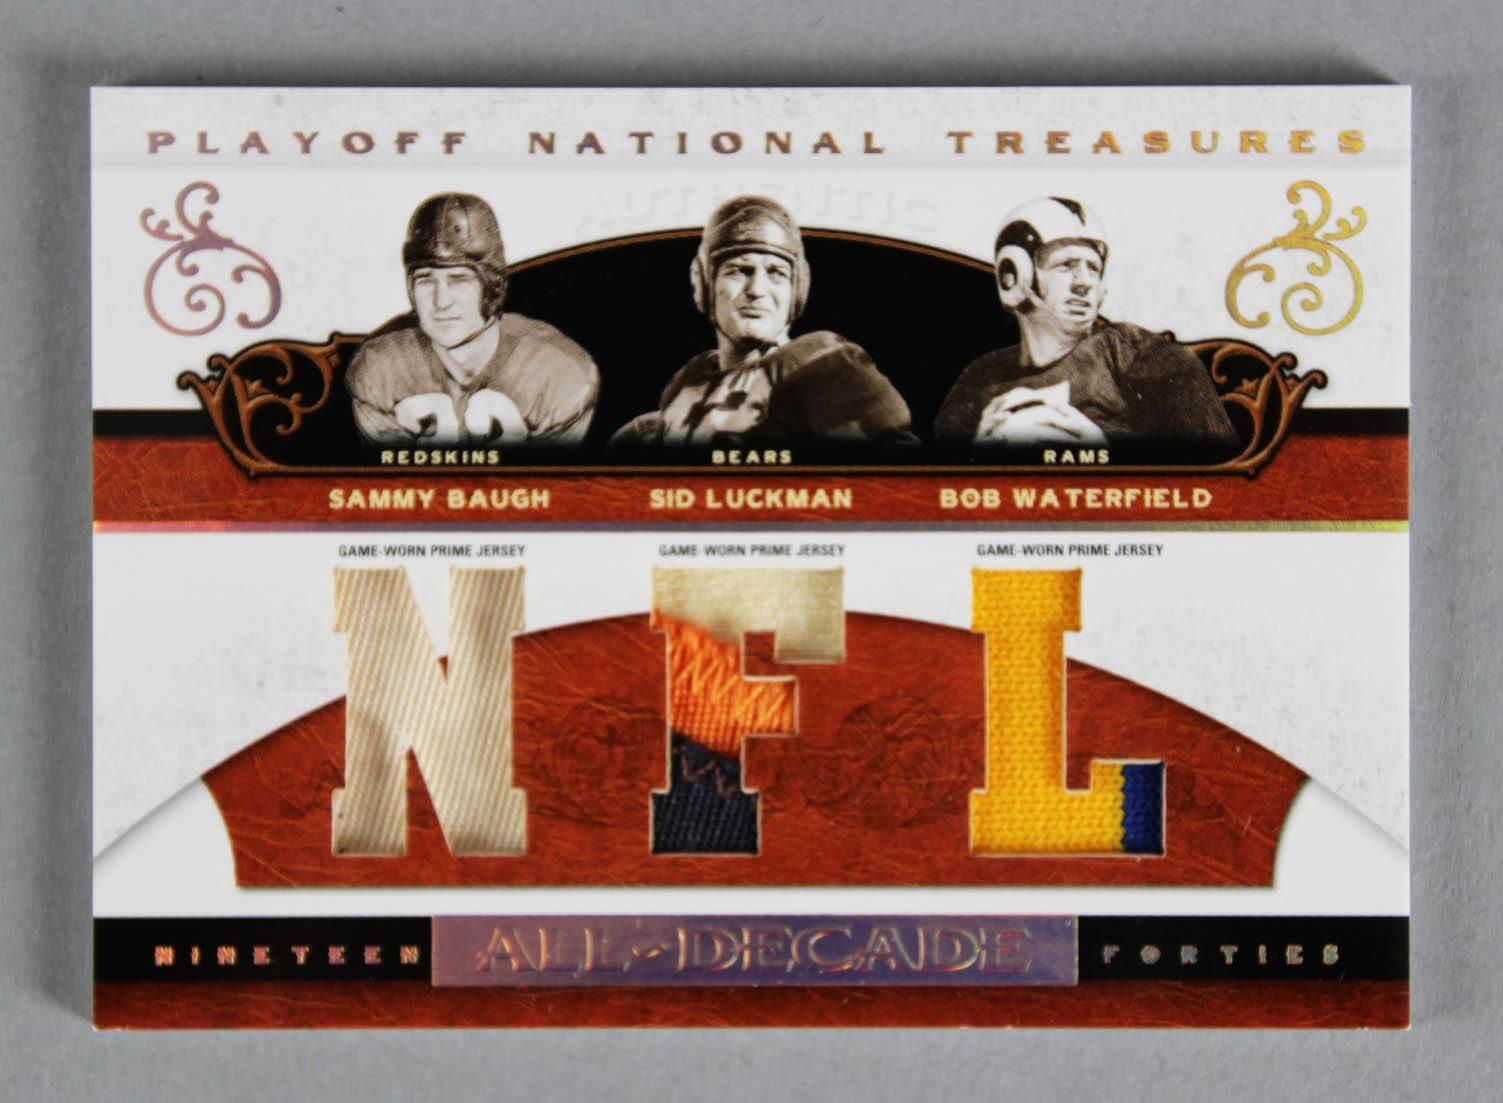 2007 National Treasures Sammy Baugh, Sid Luckman & Bob Waterfield Game-Used Jersey Card 3/10